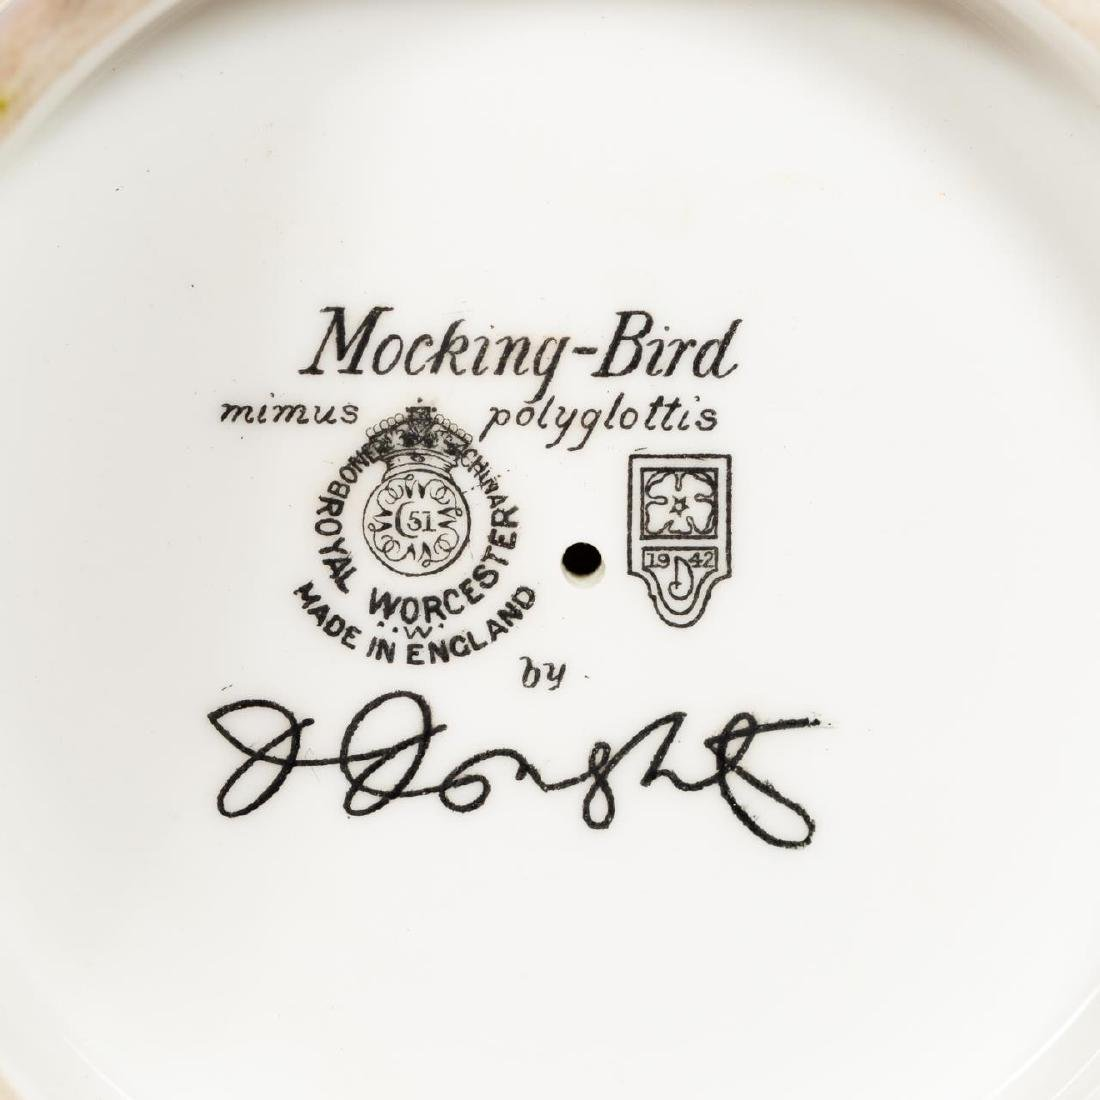 Pair, Doughty Mocking Bird Porcelain Figurines - 6